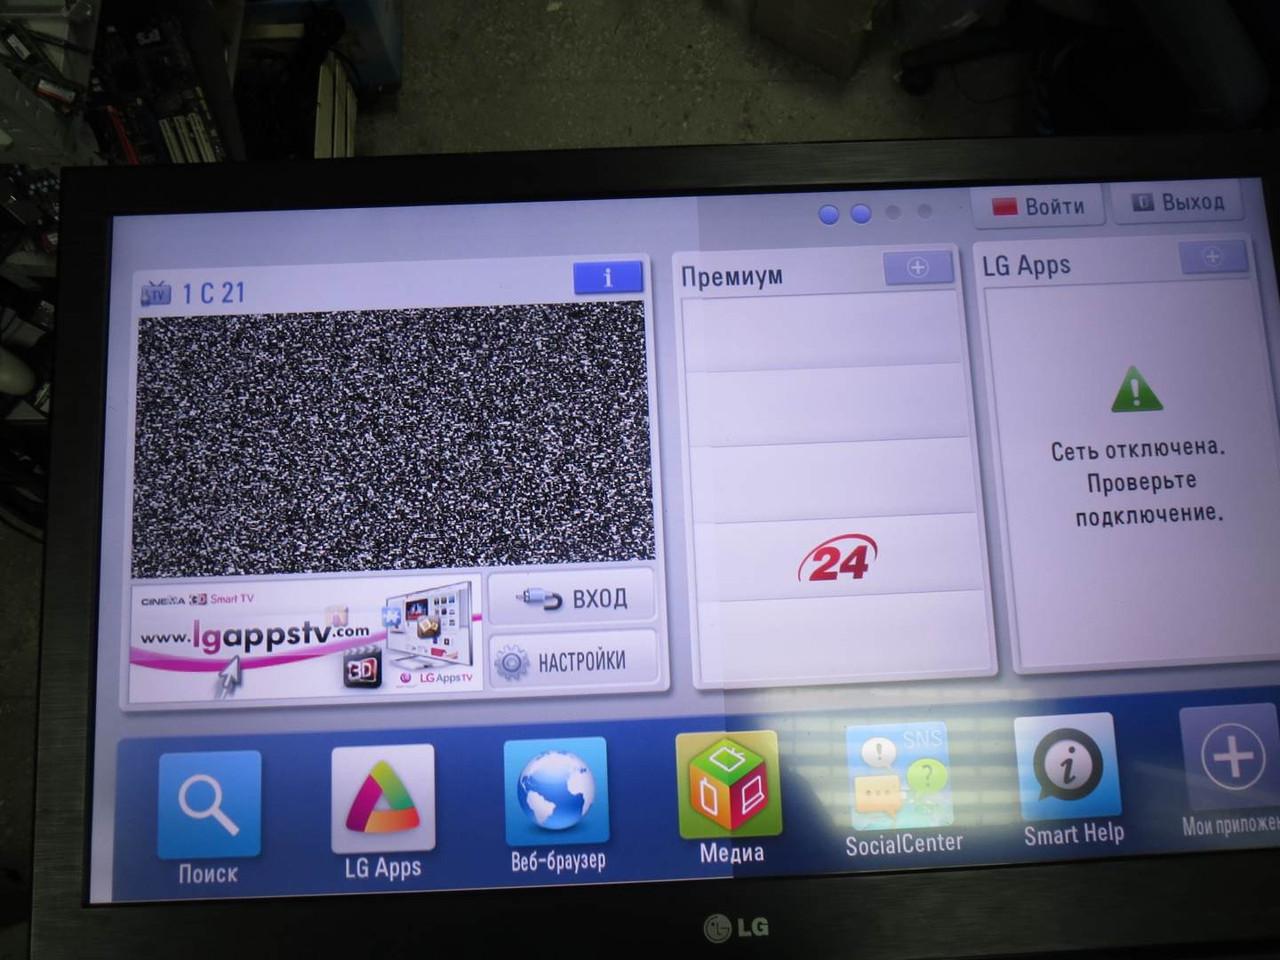 "Телевизор 32"" LG 32LV375S на запчасти (Led Driver 31T14-D06 T315HW07 V8, T460HW03, Матрица T315HW07 V.8.)"